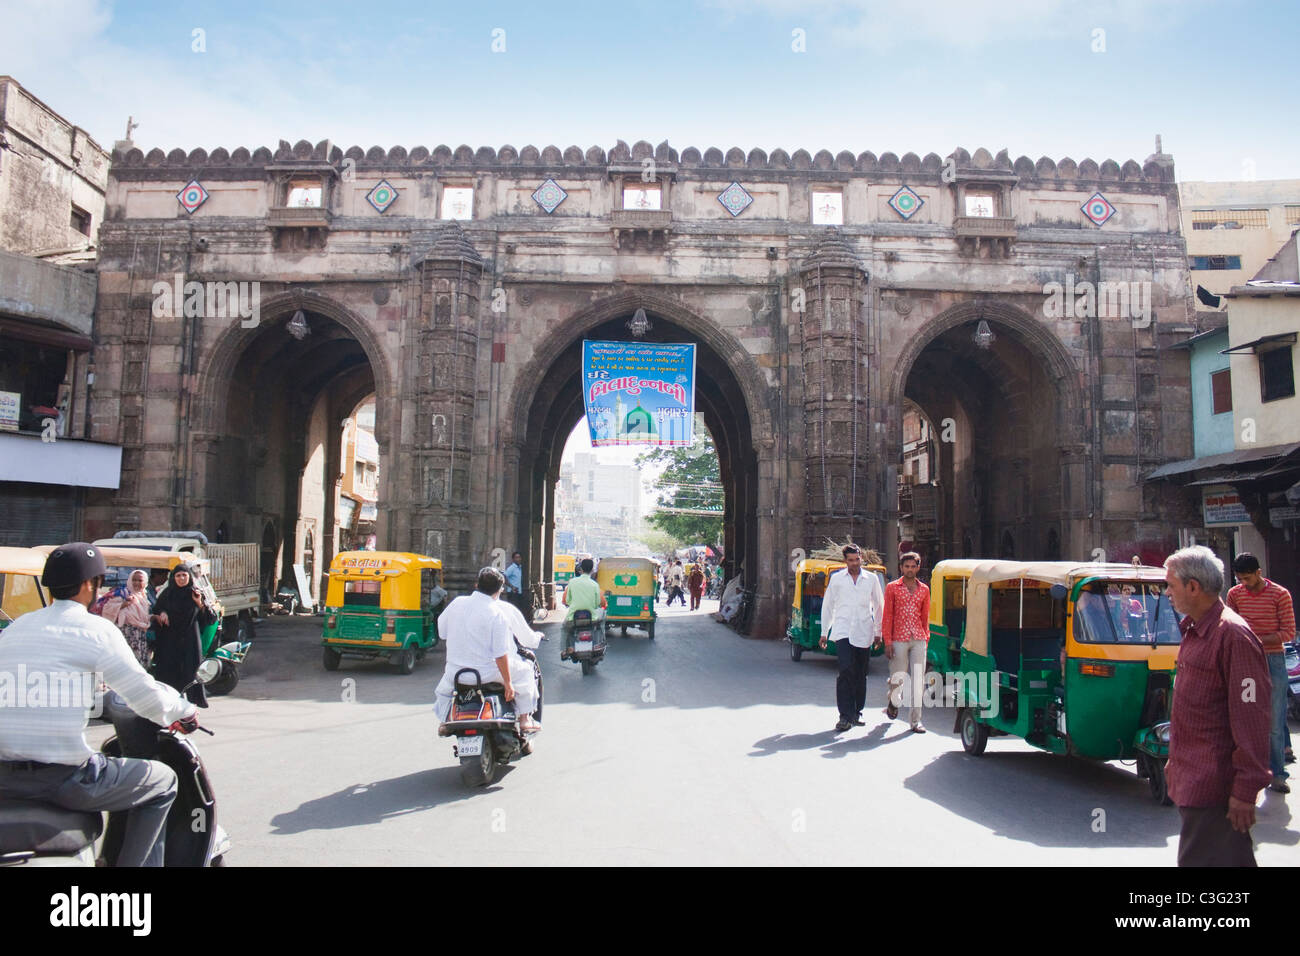 Historic gateway in a city, Teen Darwaja, Ahmedabad, Gujarat, India - Stock Image